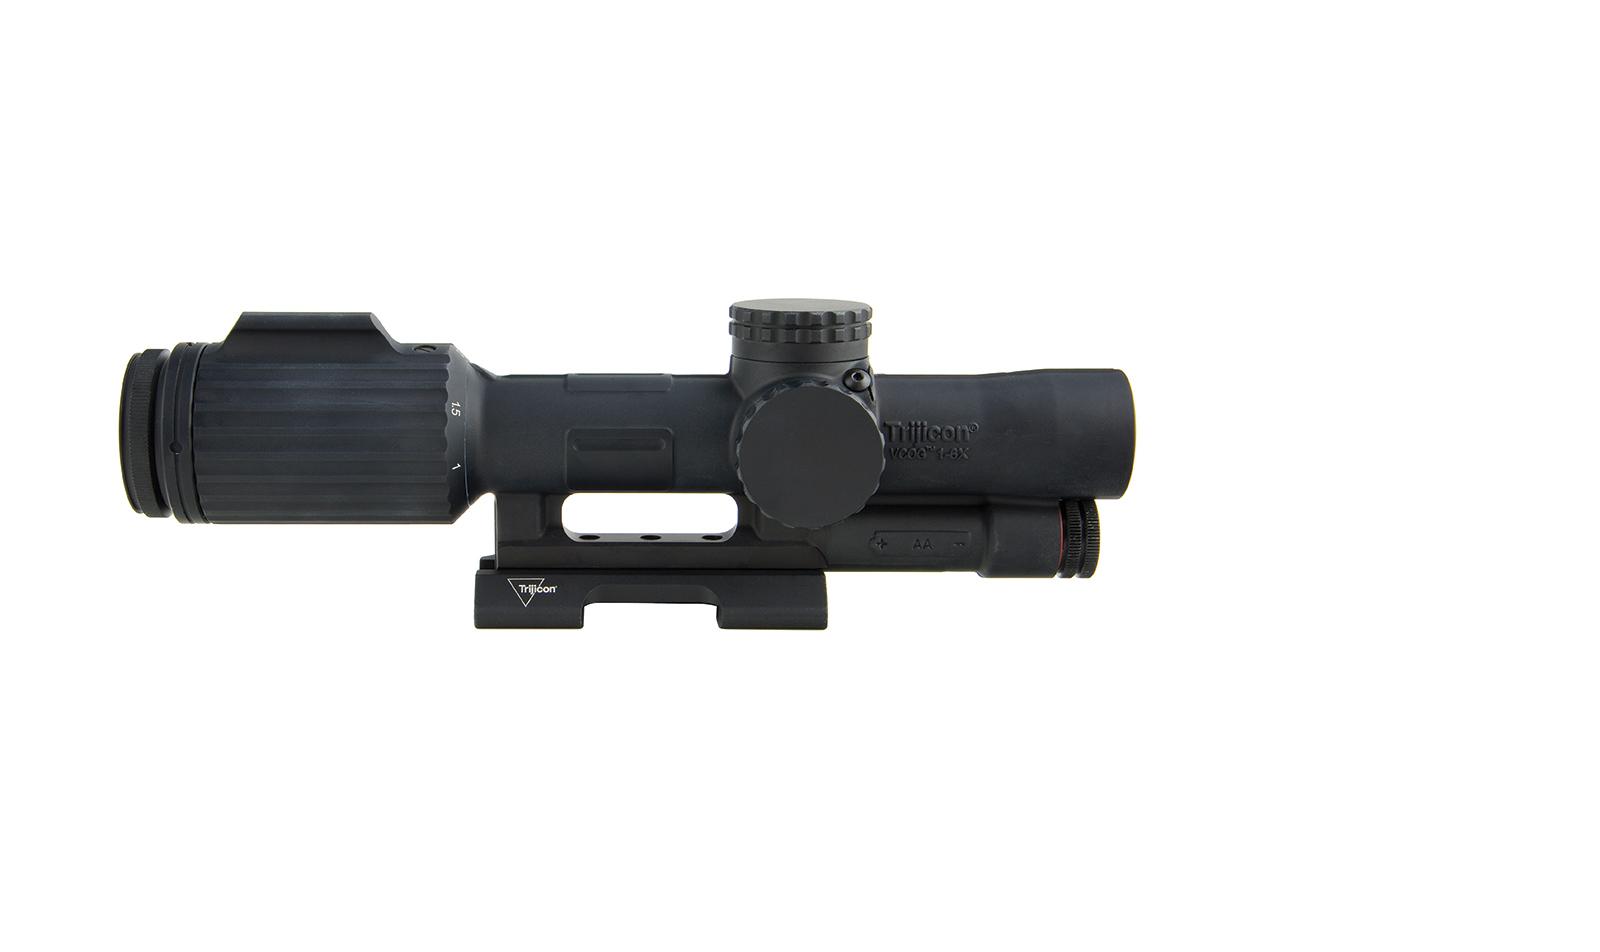 VC16-C-1600048 angle 6